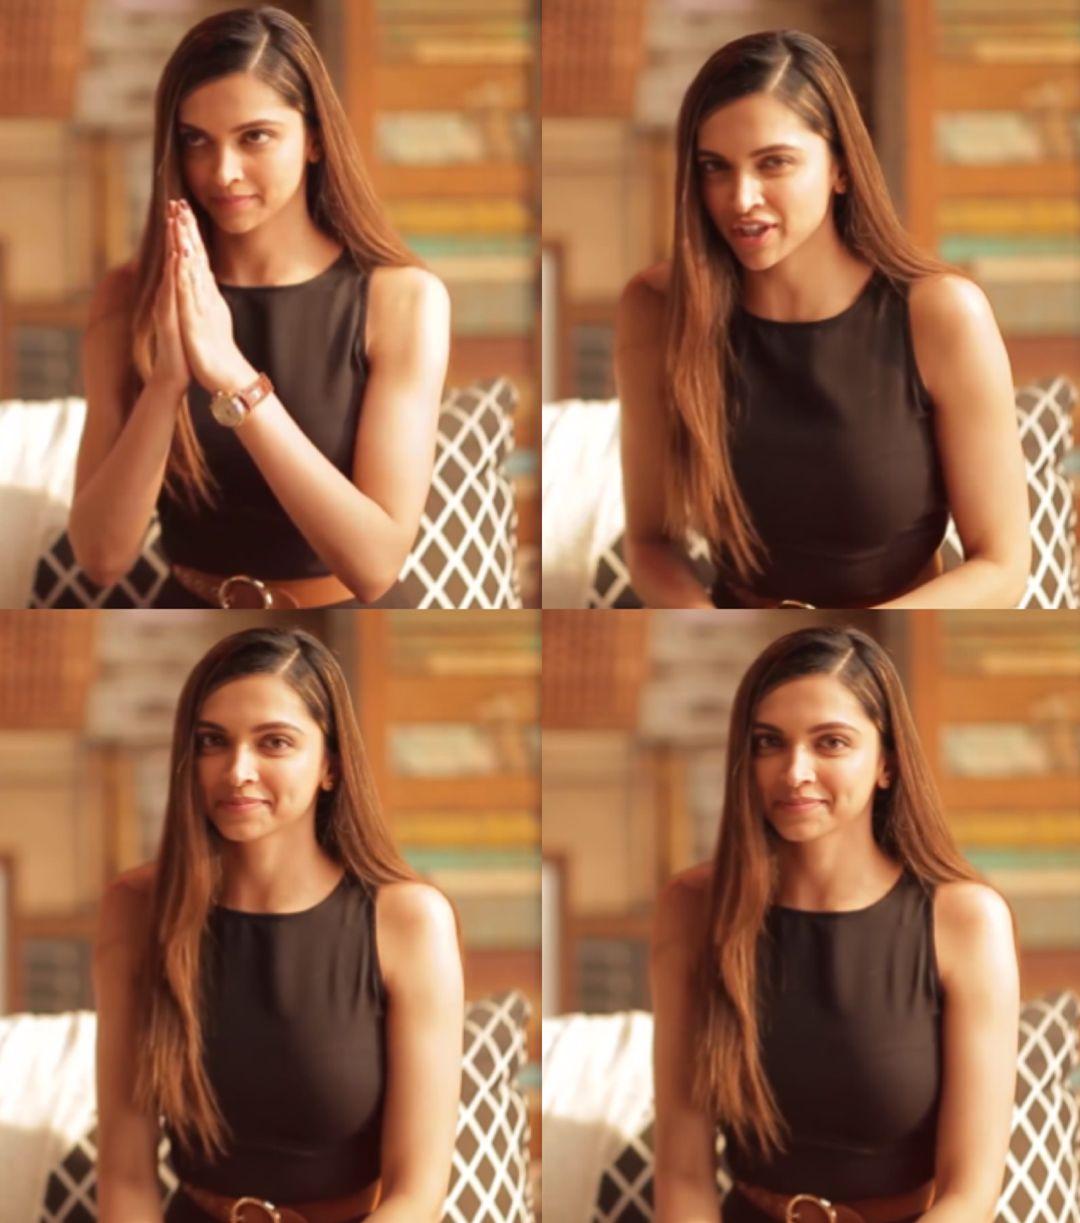 Deepika Padukone for All About You ad 2016 | Deepika padukone